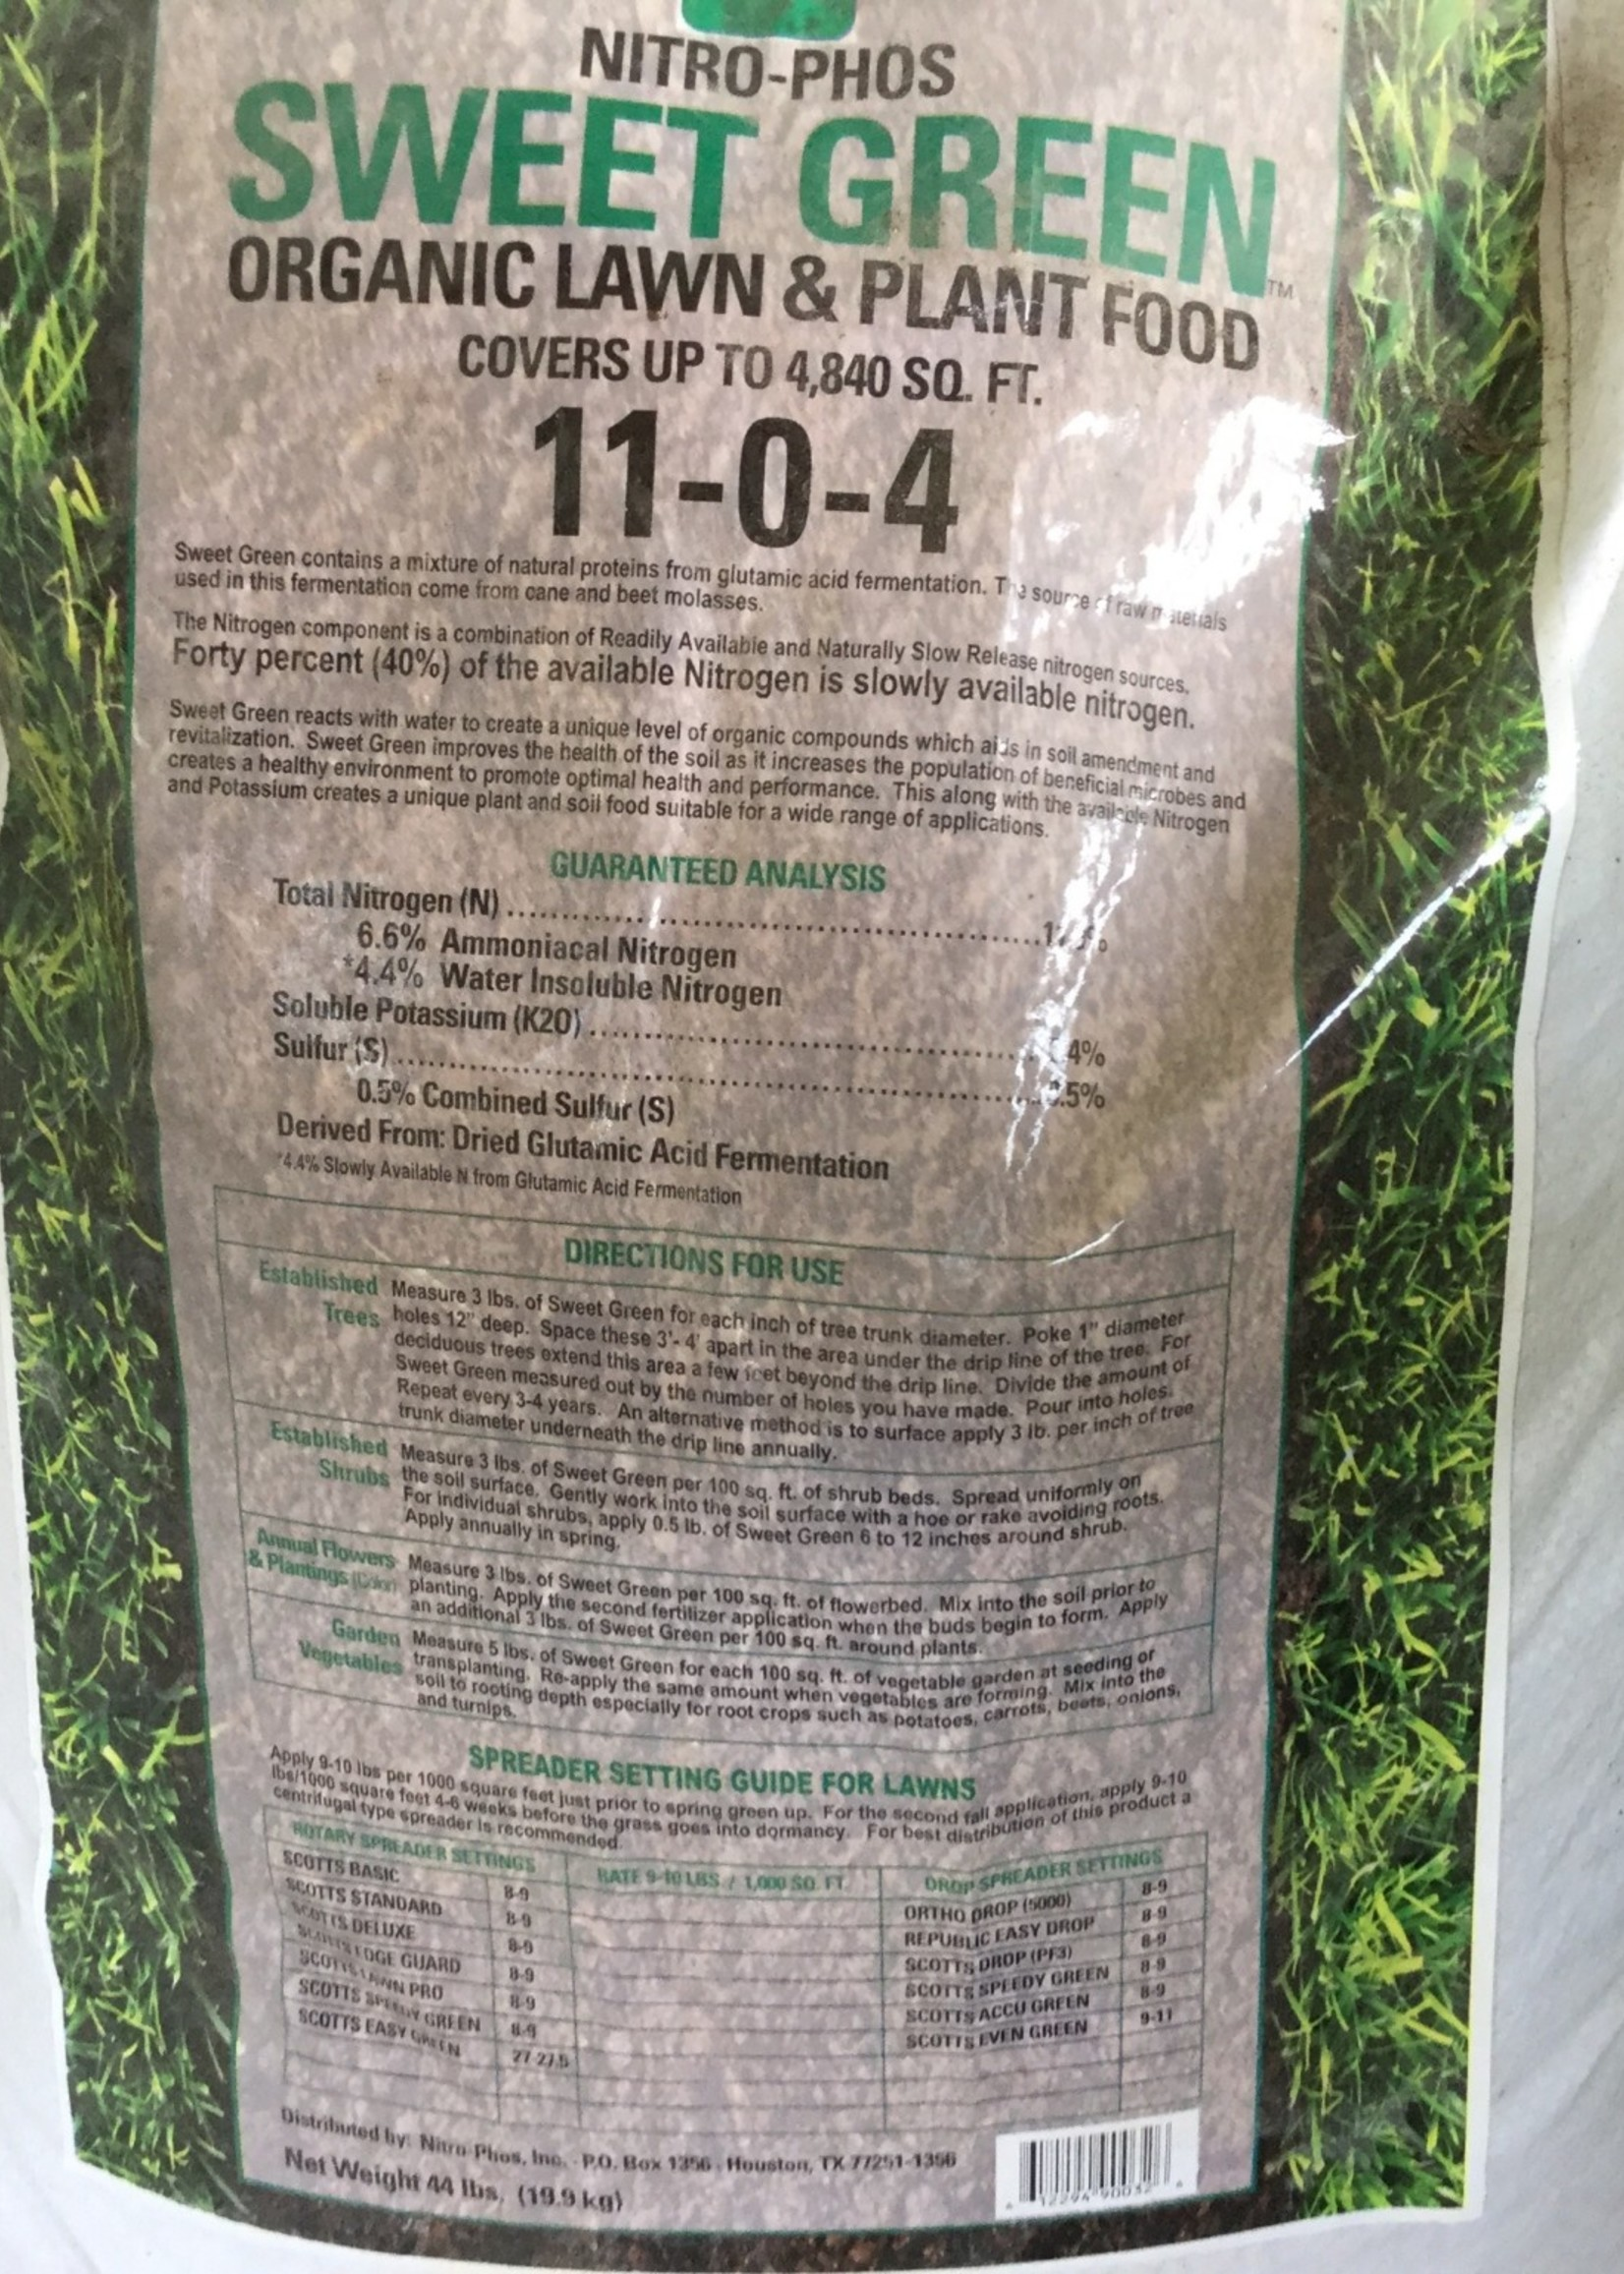 Nitro Phos Sweet Green Lawn Fertilizer 44 lbs. 11-0-4